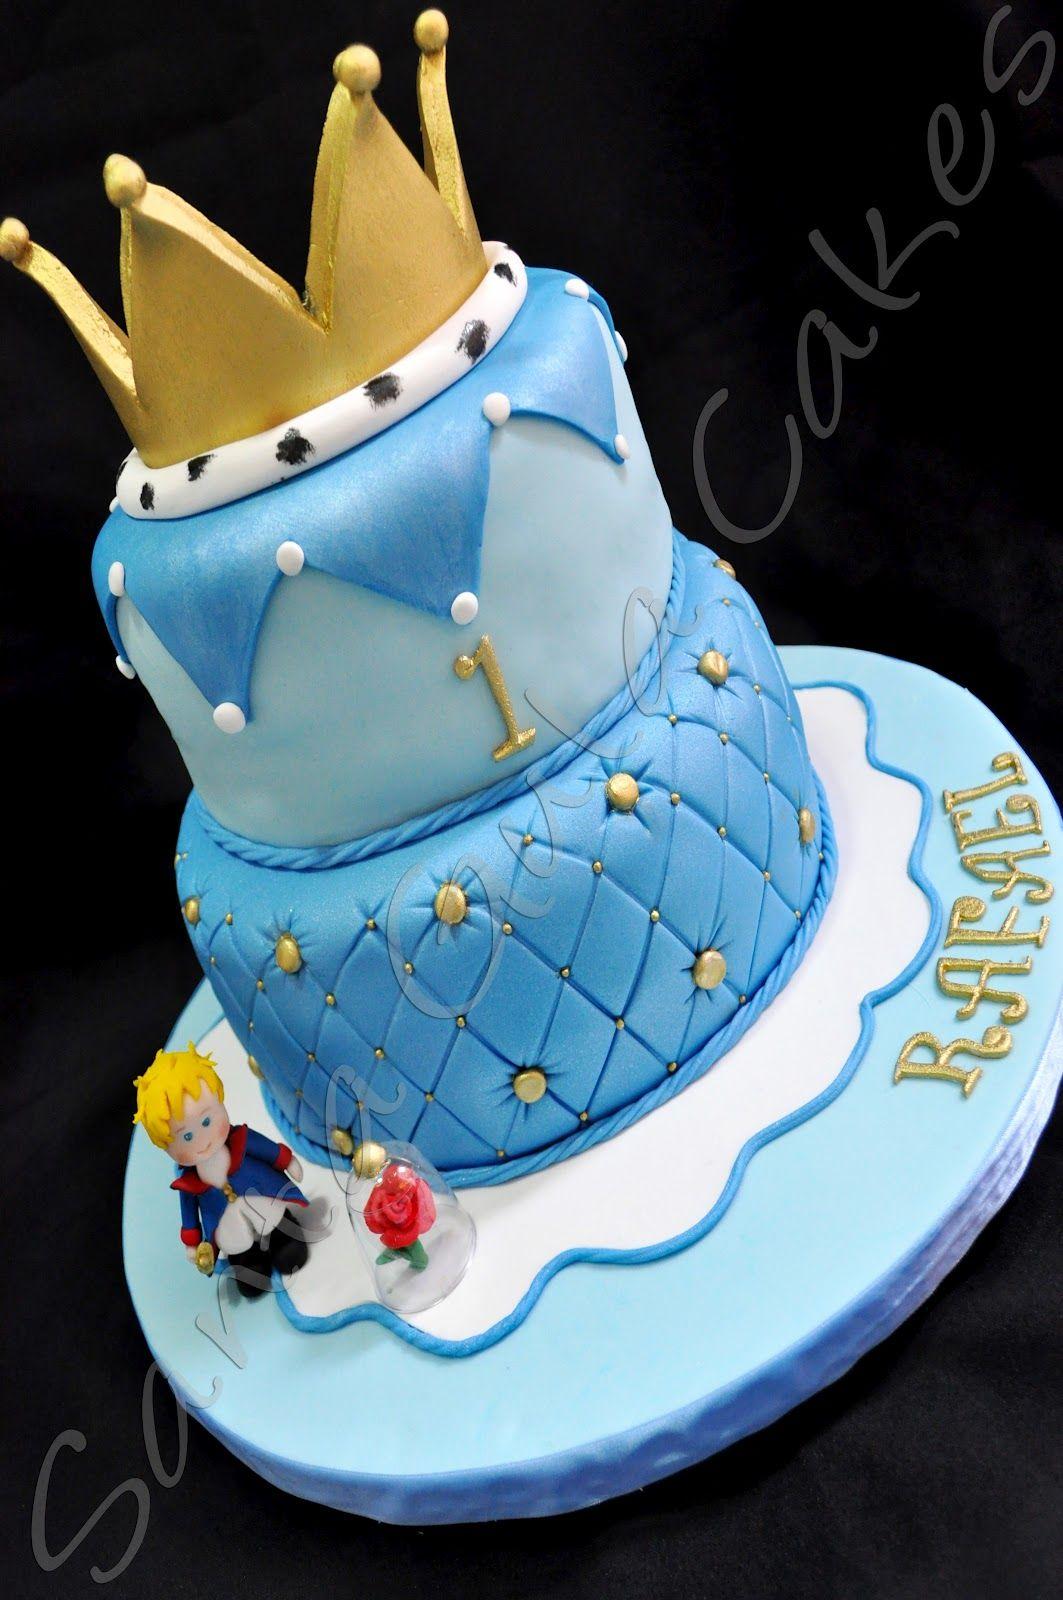 Decoracao fazendinha luxo bolo falso ccs decoracoes eventos car - Bolo Pequeno Principe Coroa